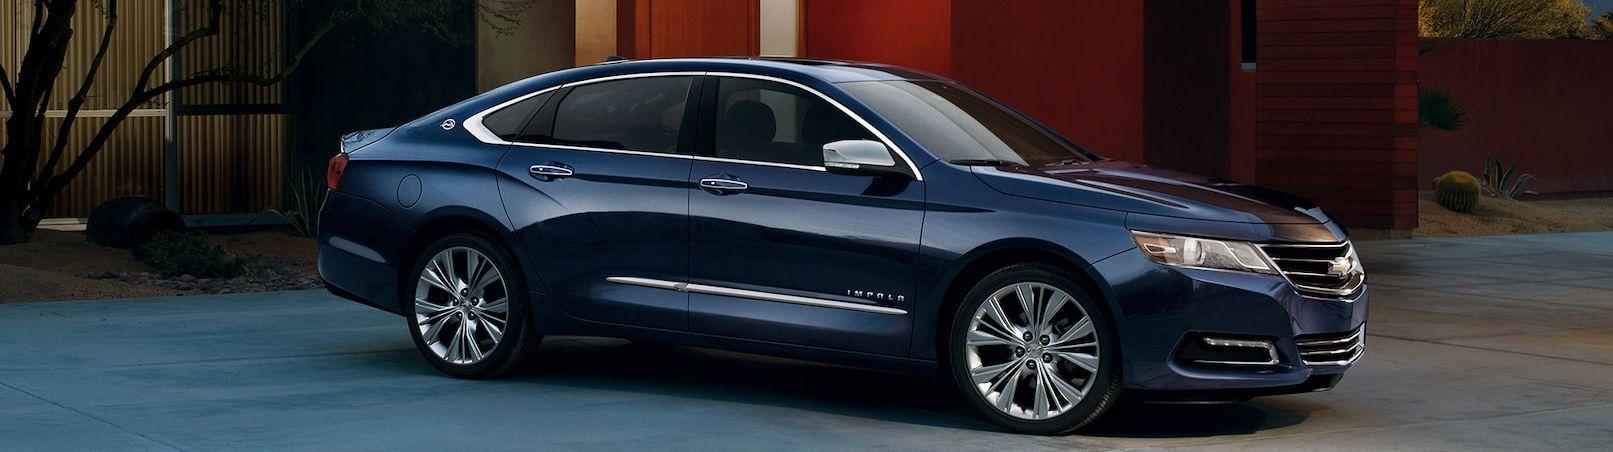 2019 Chevrolet Impala for Sale near Lansing, MI